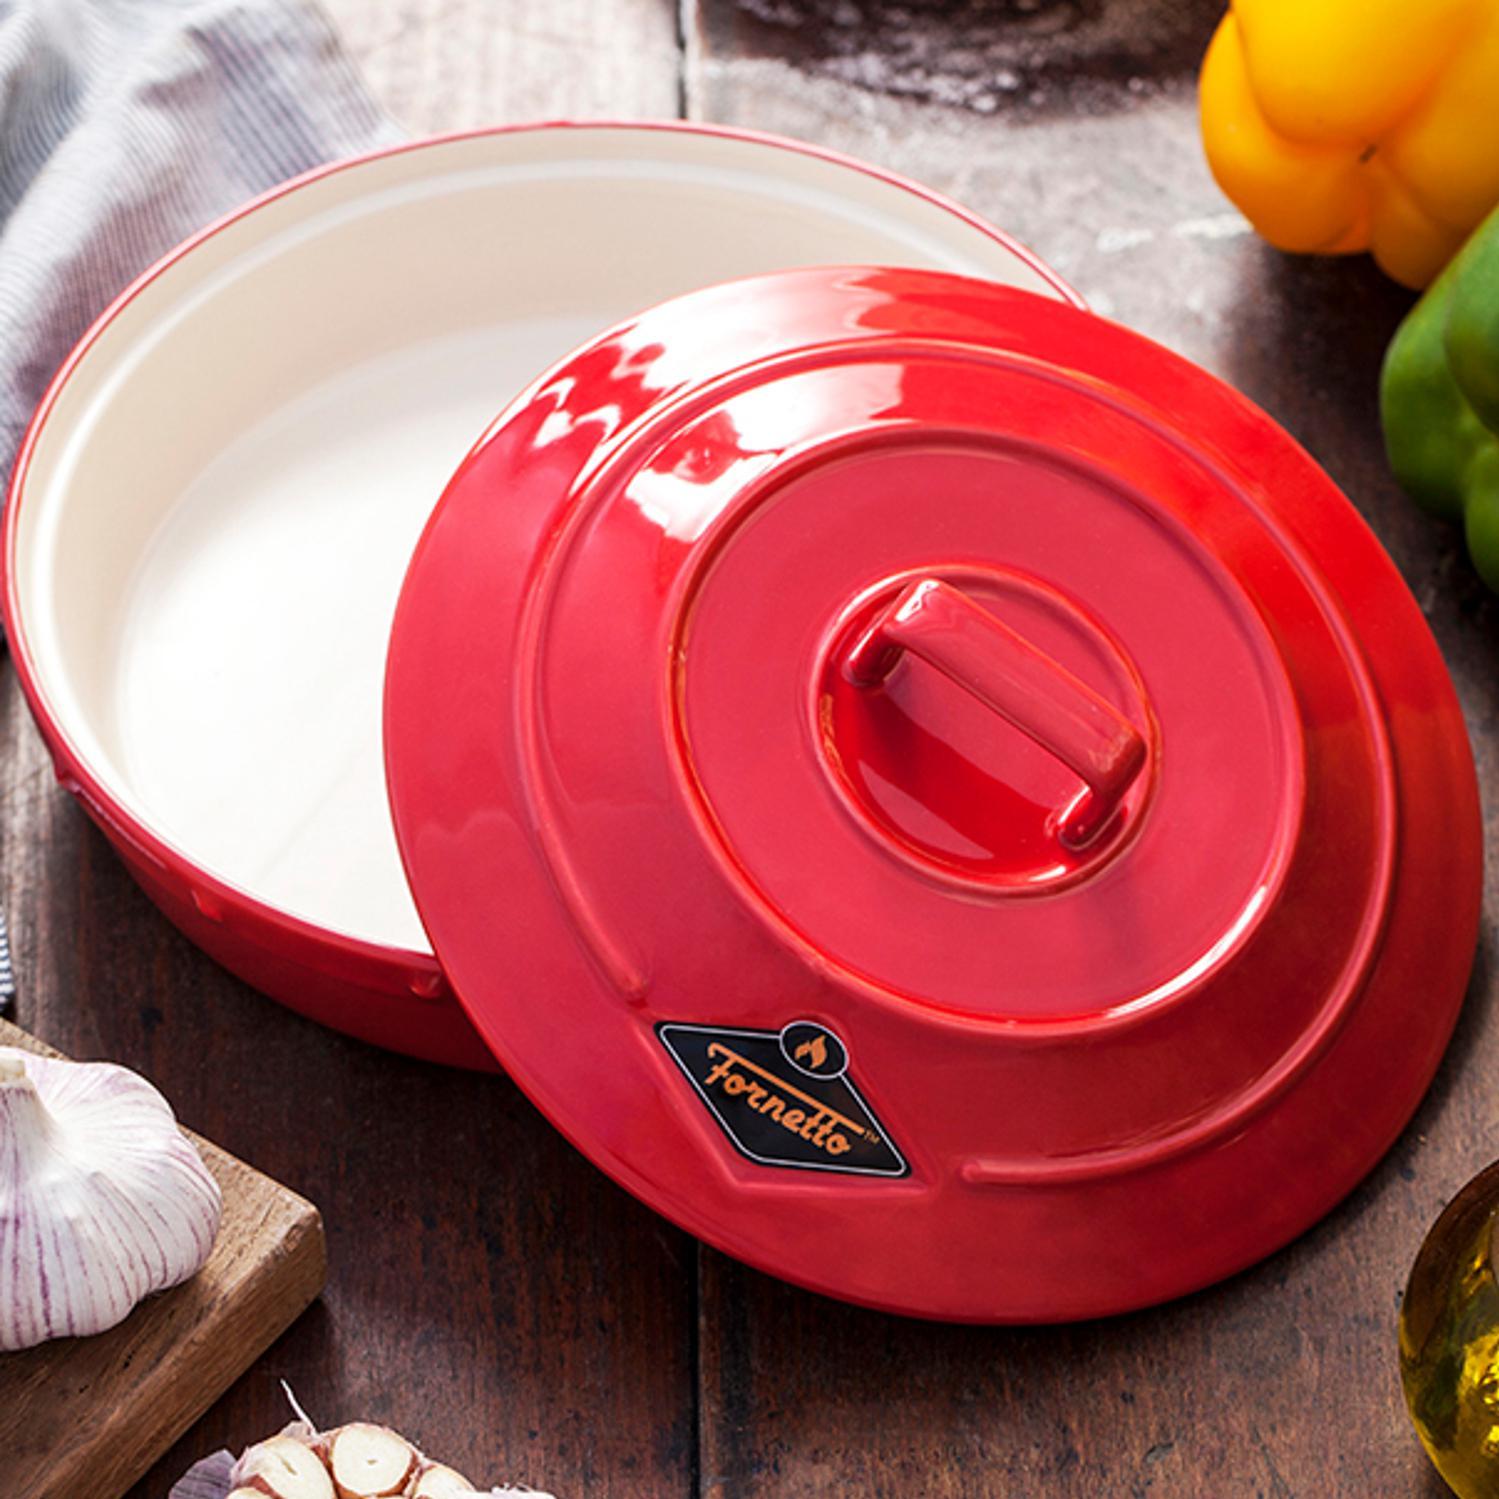 Picture of Fornetto Ceramic Garlic Roaster And Tortilla Warmer